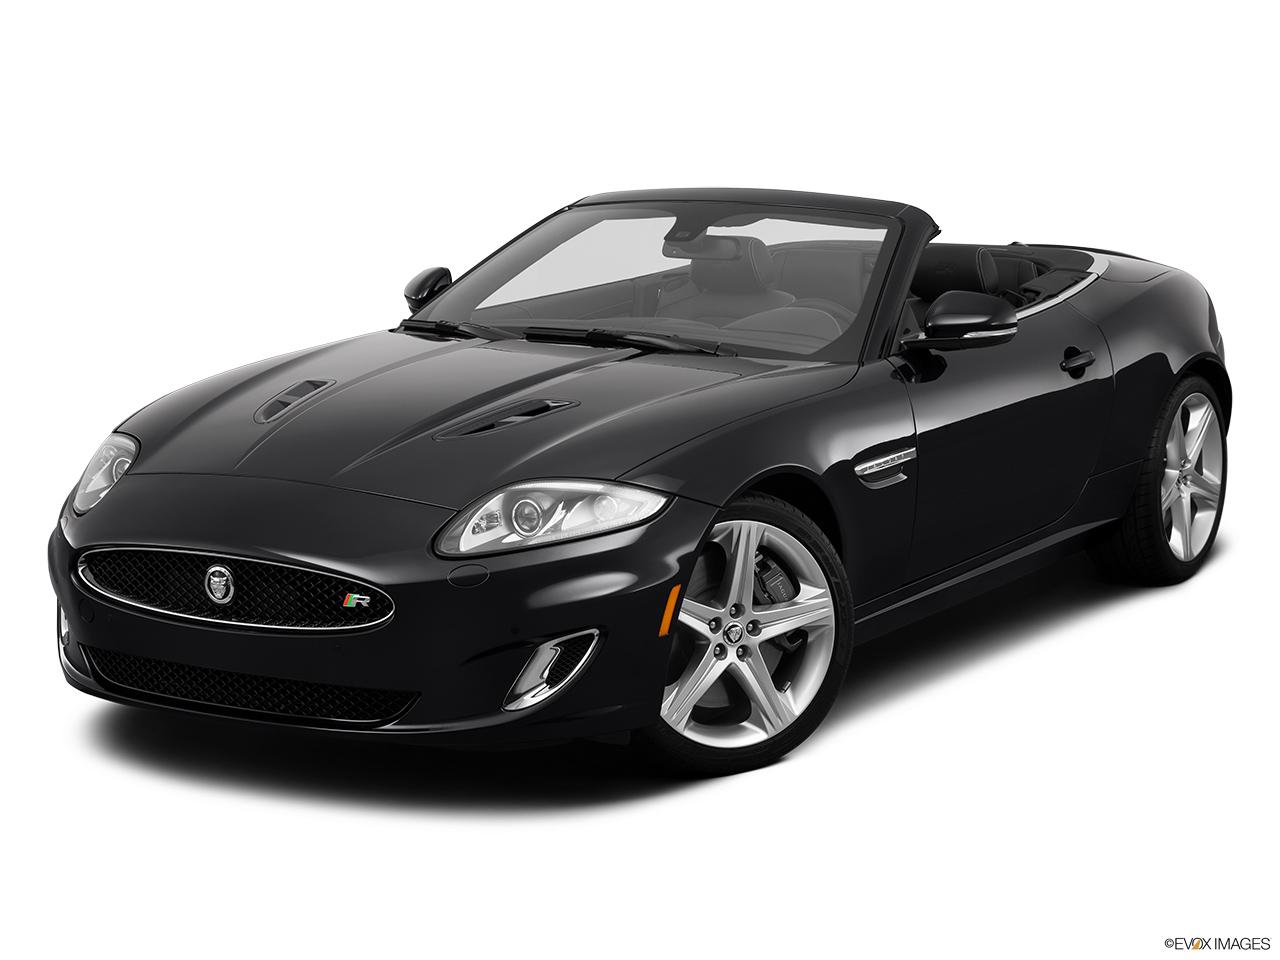 2014 jaguar xk convertible xkr. Black Bedroom Furniture Sets. Home Design Ideas